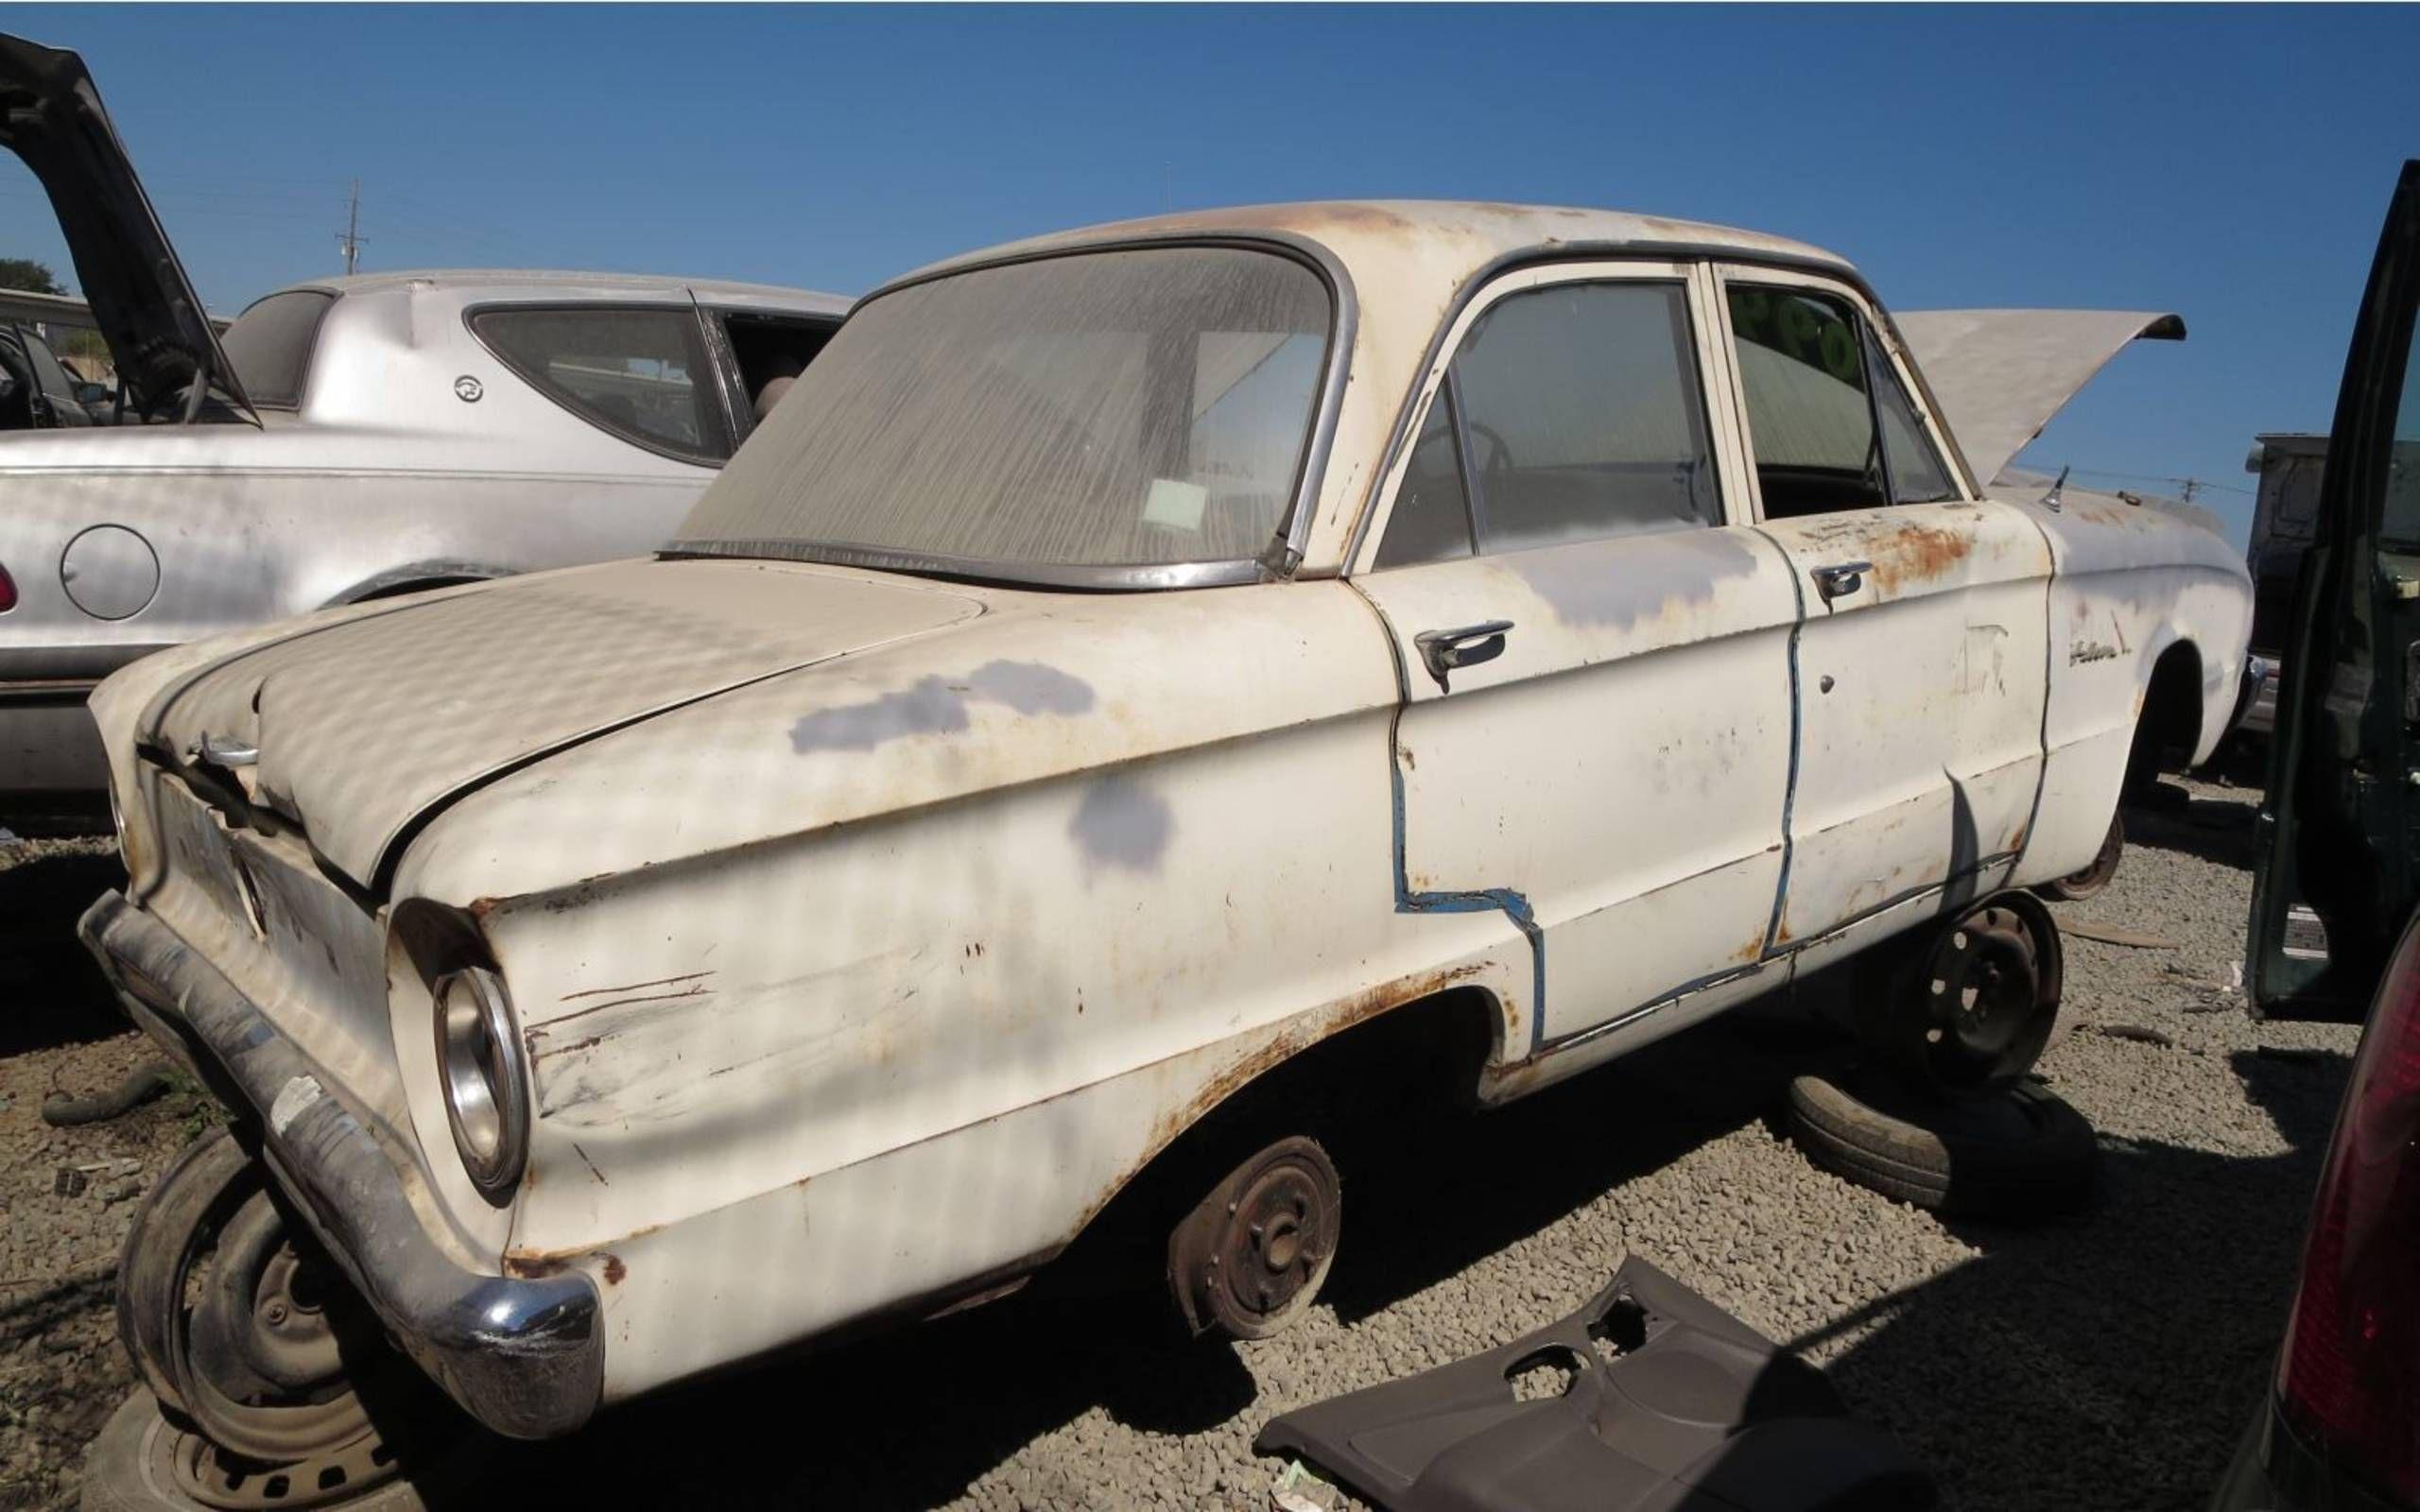 Junkyard Treasure 1960 Ford Falcon Sedan